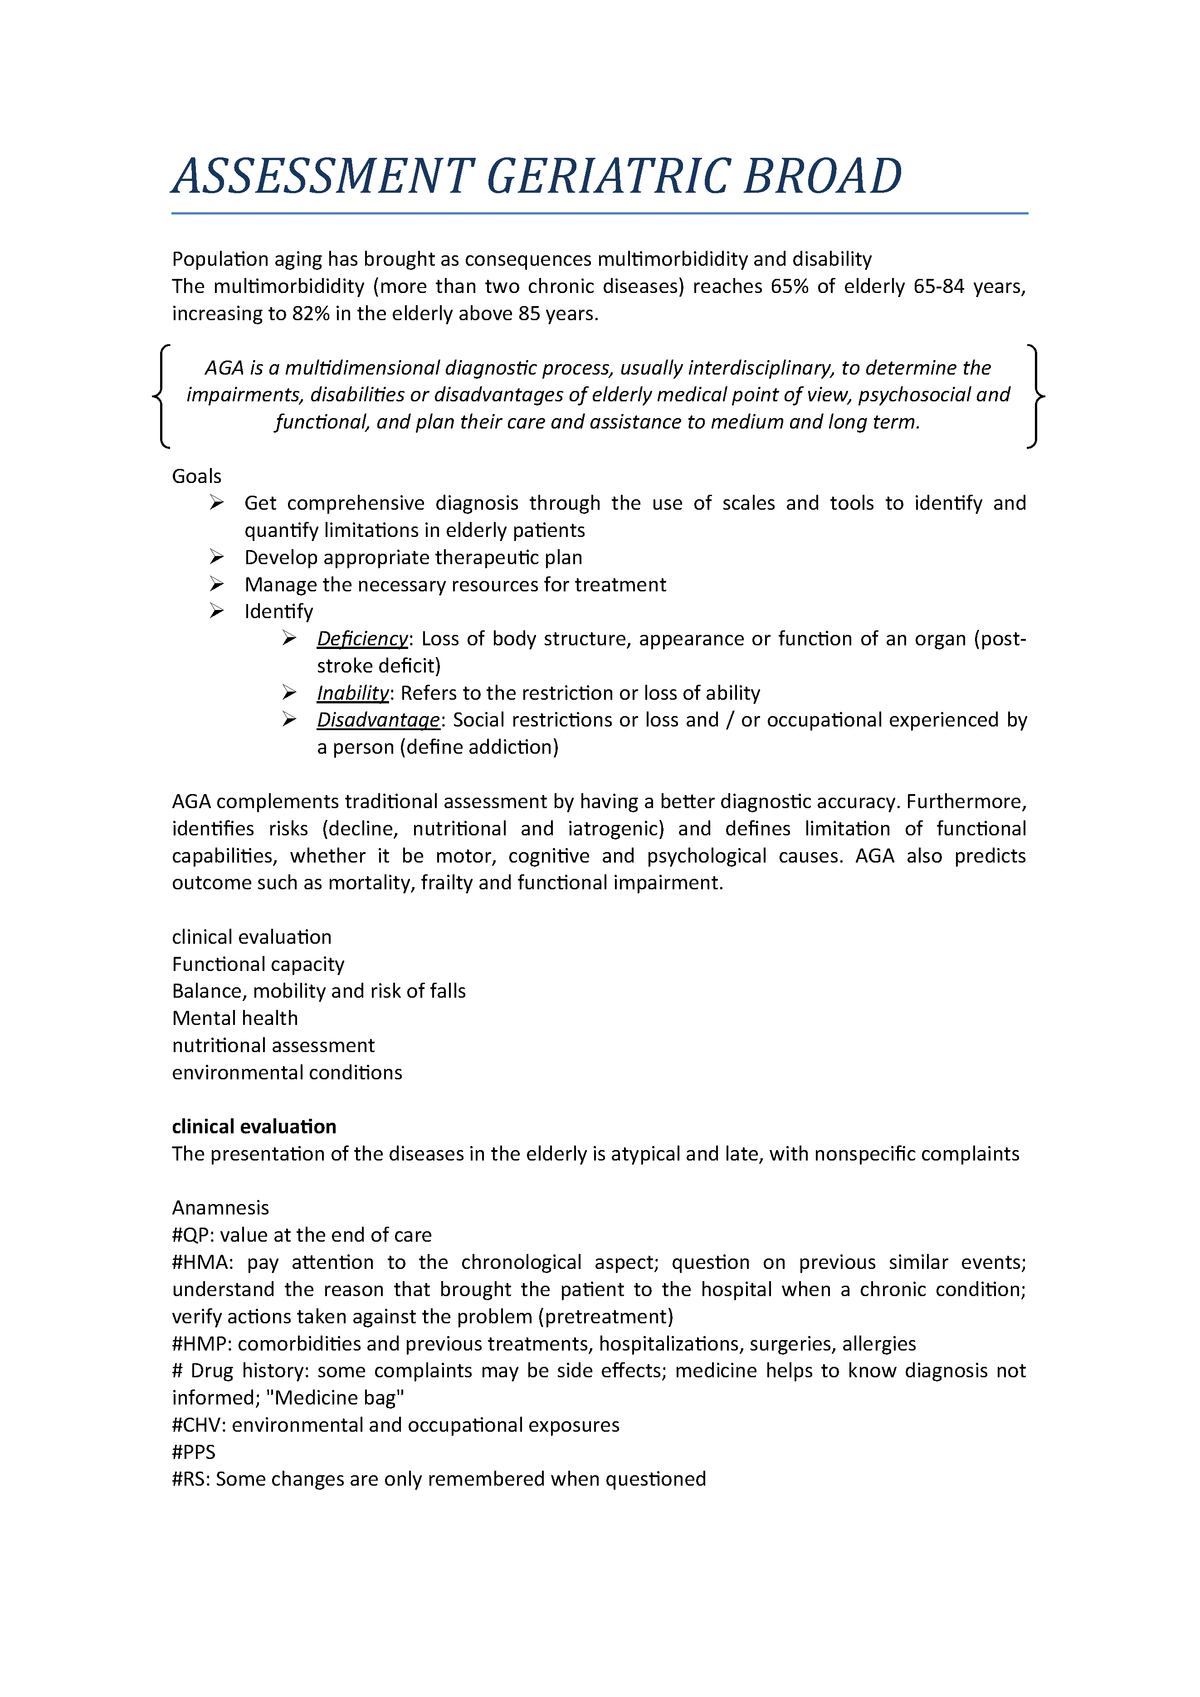 Assessment Geriatric Broad Psy 255 Cognitive Psychology Studocu